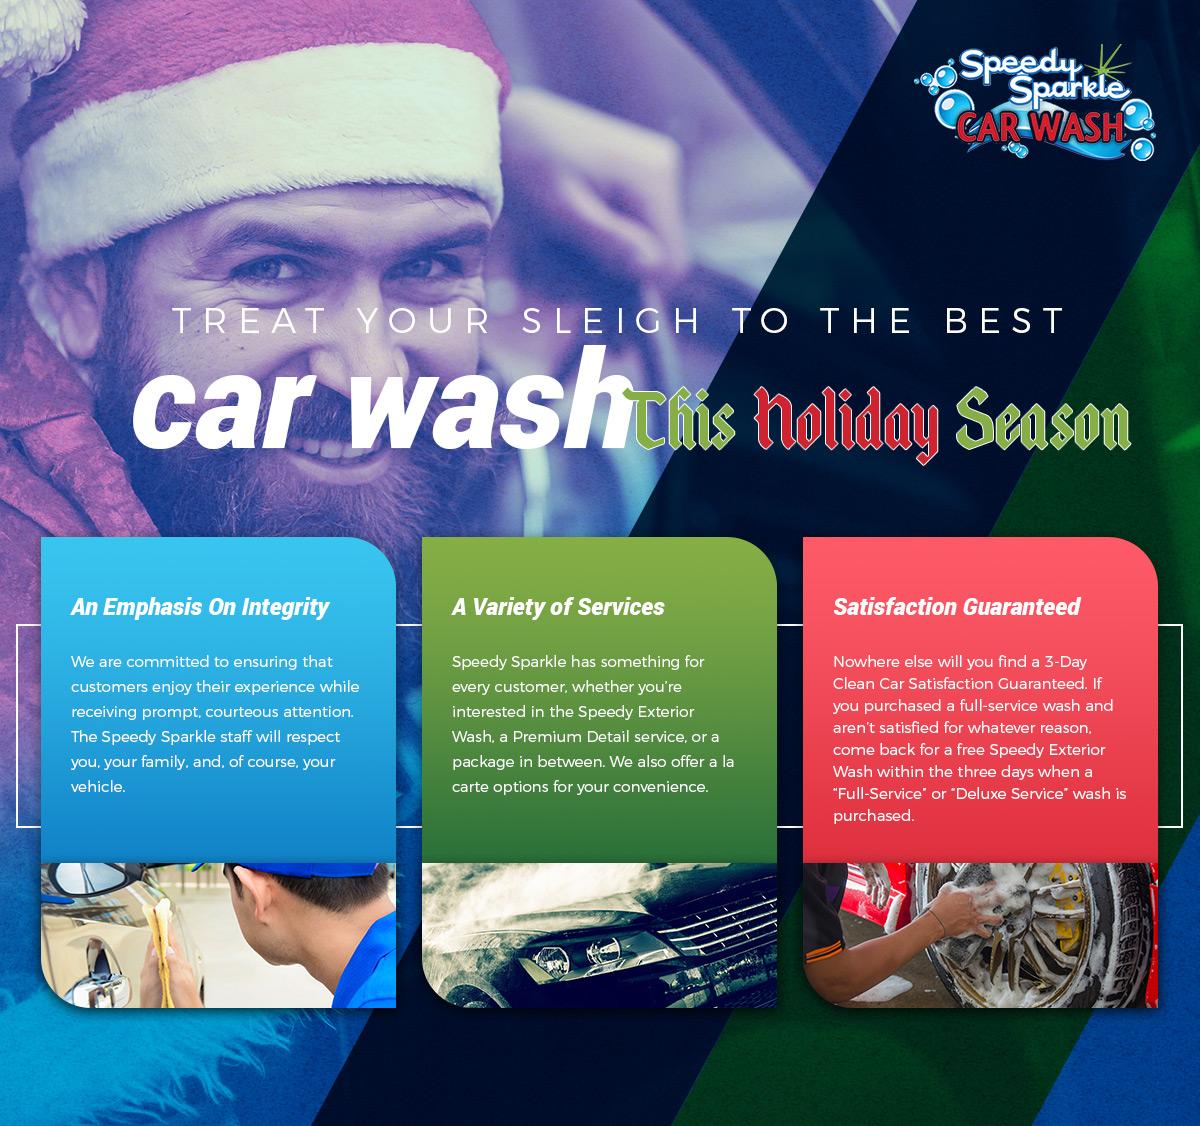 Car Wash Deals >> Car Wash Loveland Happy Holidays From Speedy Sparkle